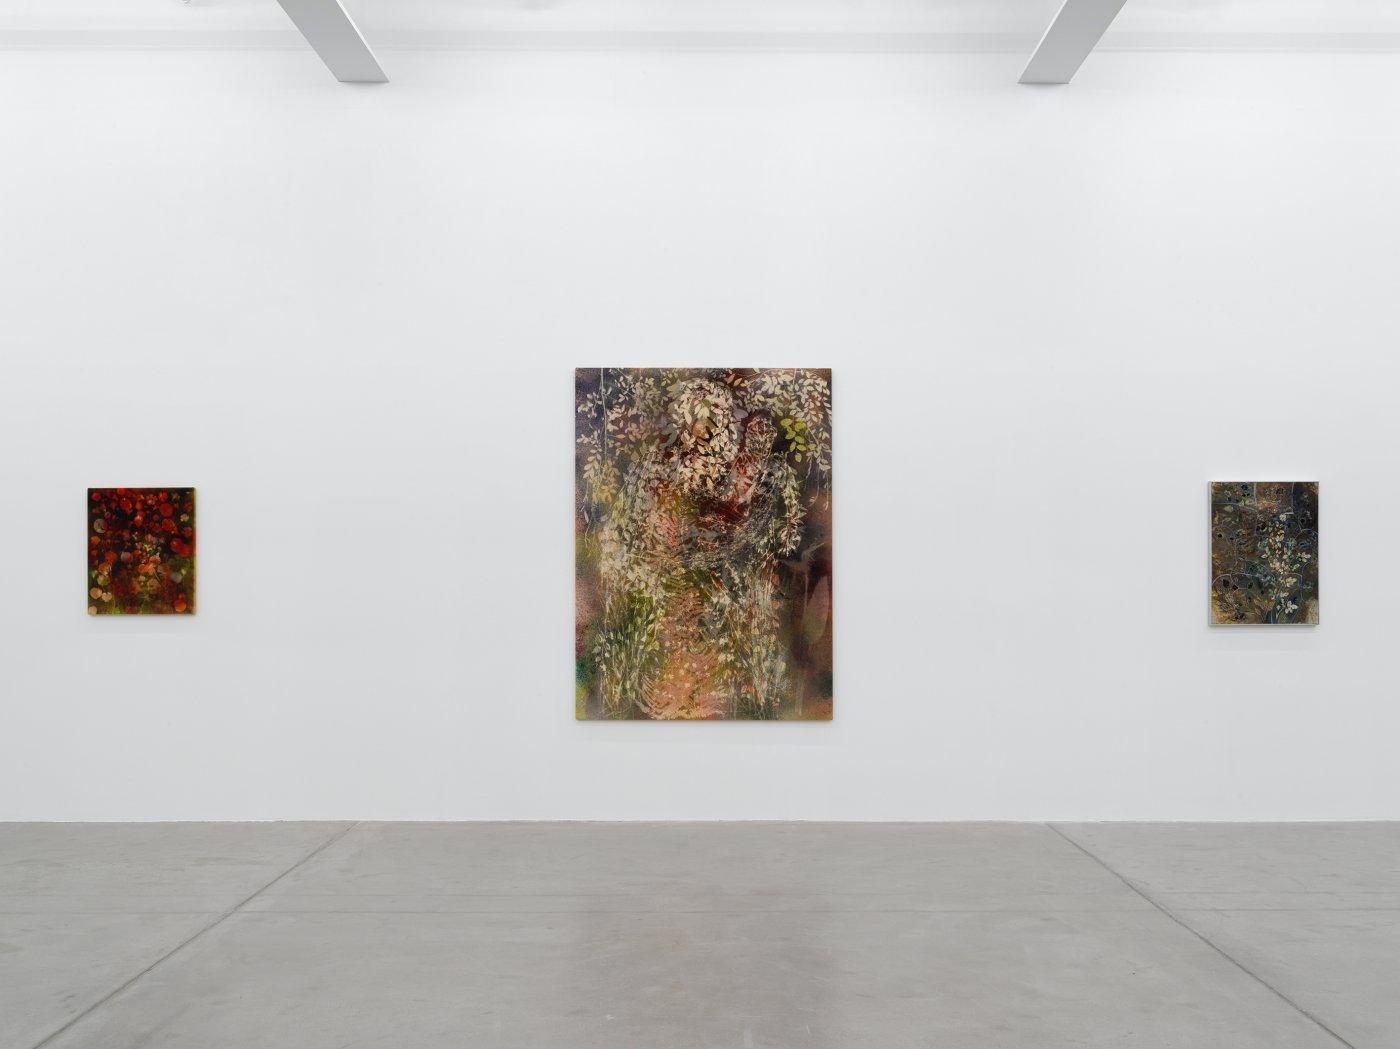 Galerie Eva Presenhuber Maag Areal Sam Falls 11